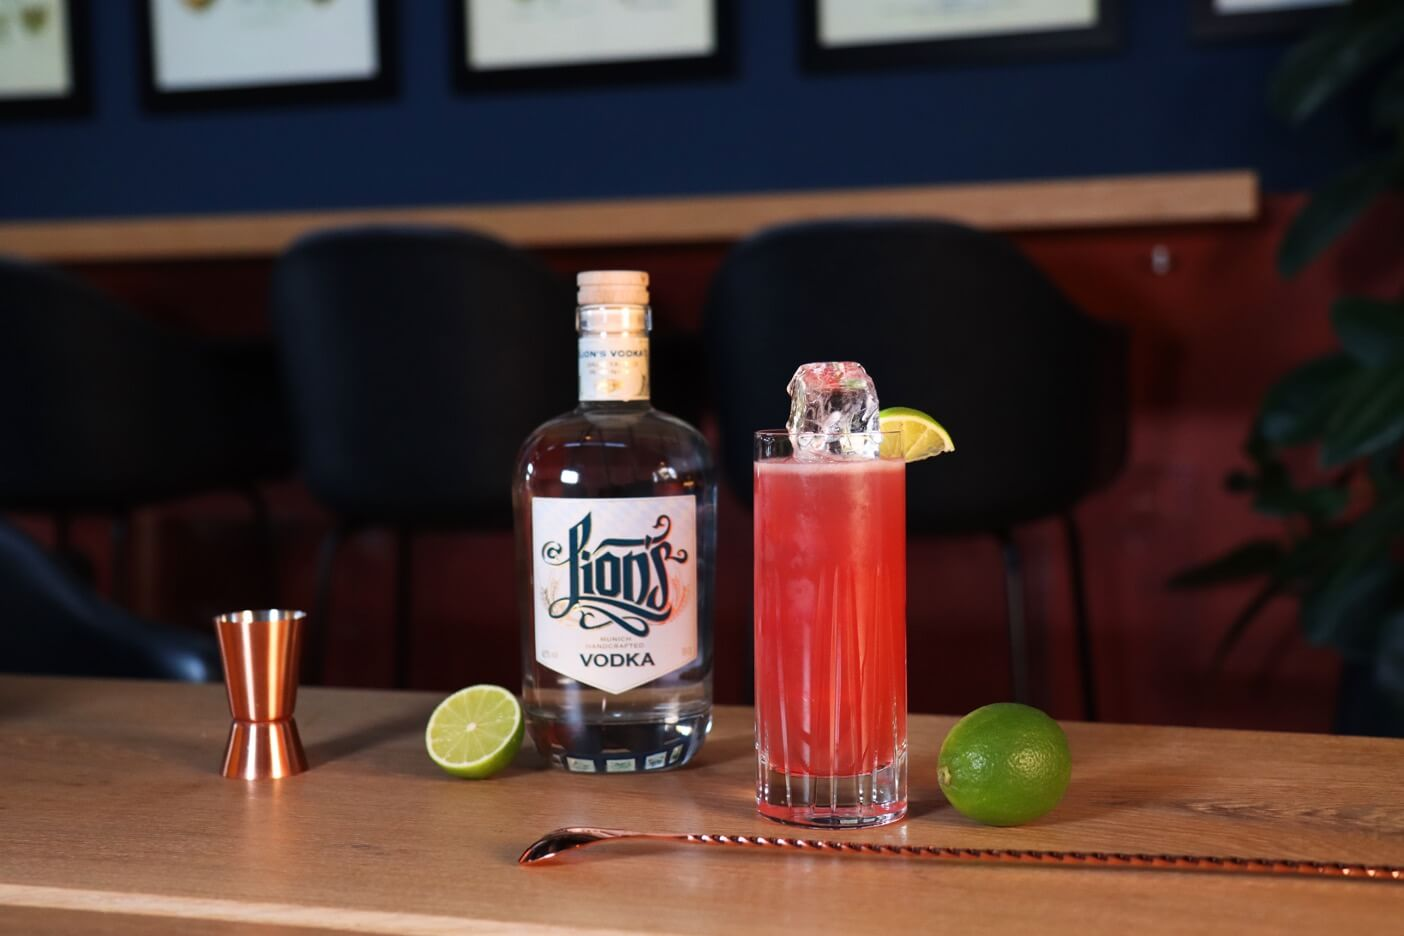 Cocktail Klassiker Cape Cod im Highball Glas mit LION's Vodka